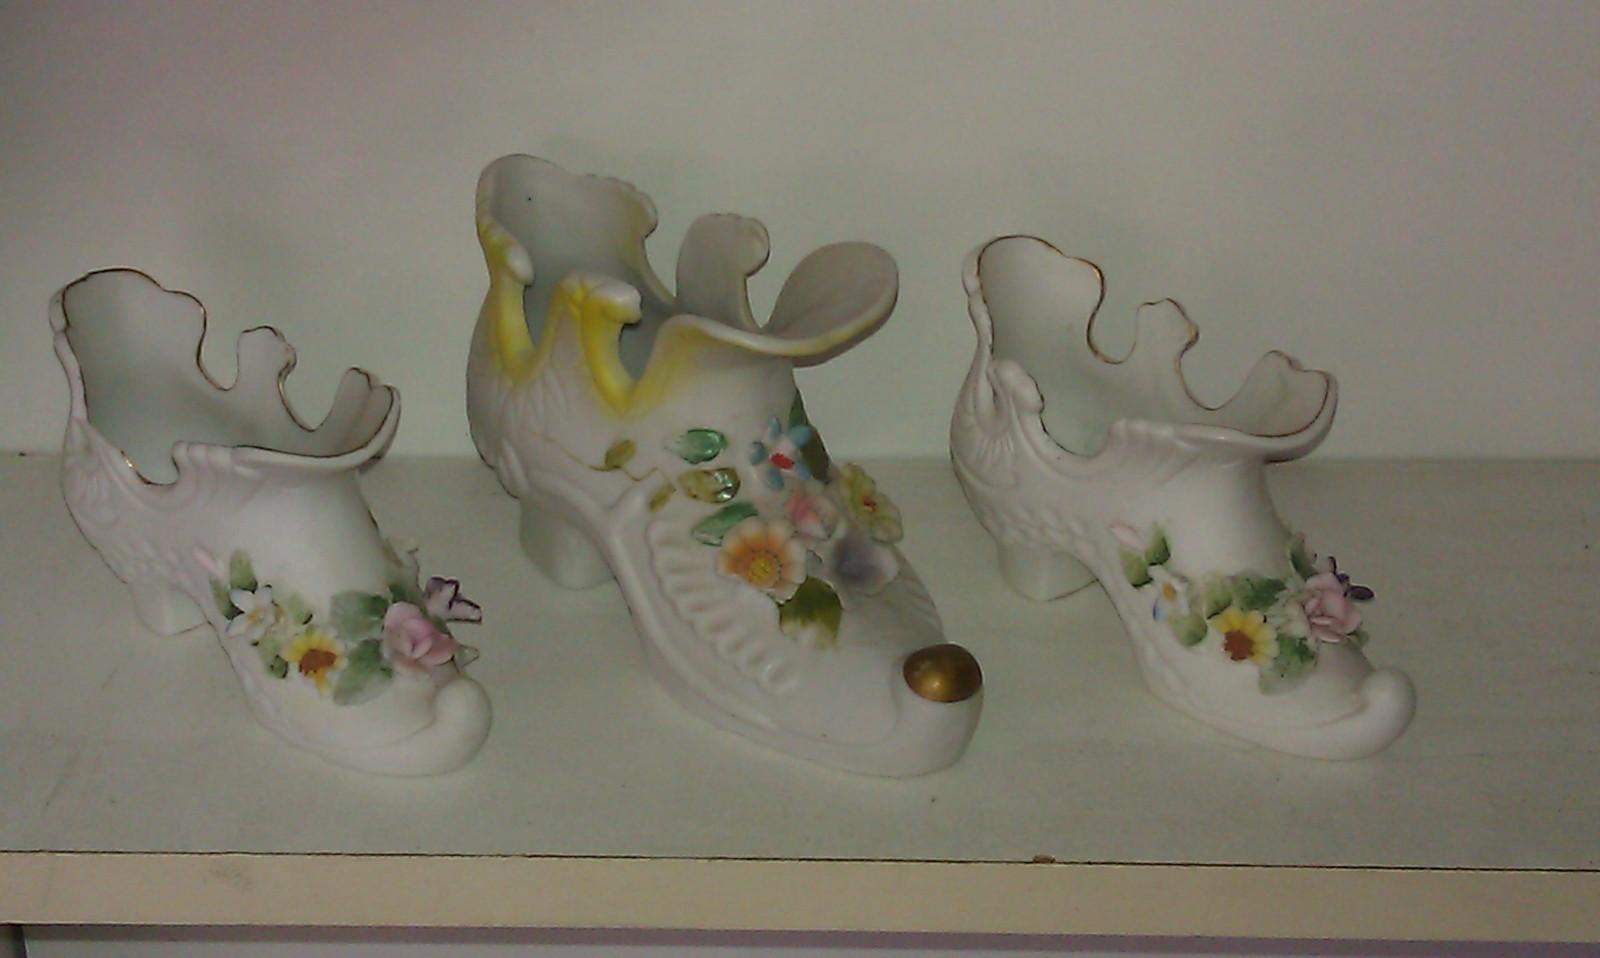 Lefton  Raised Flower Shoes Set of 3 - $18.13